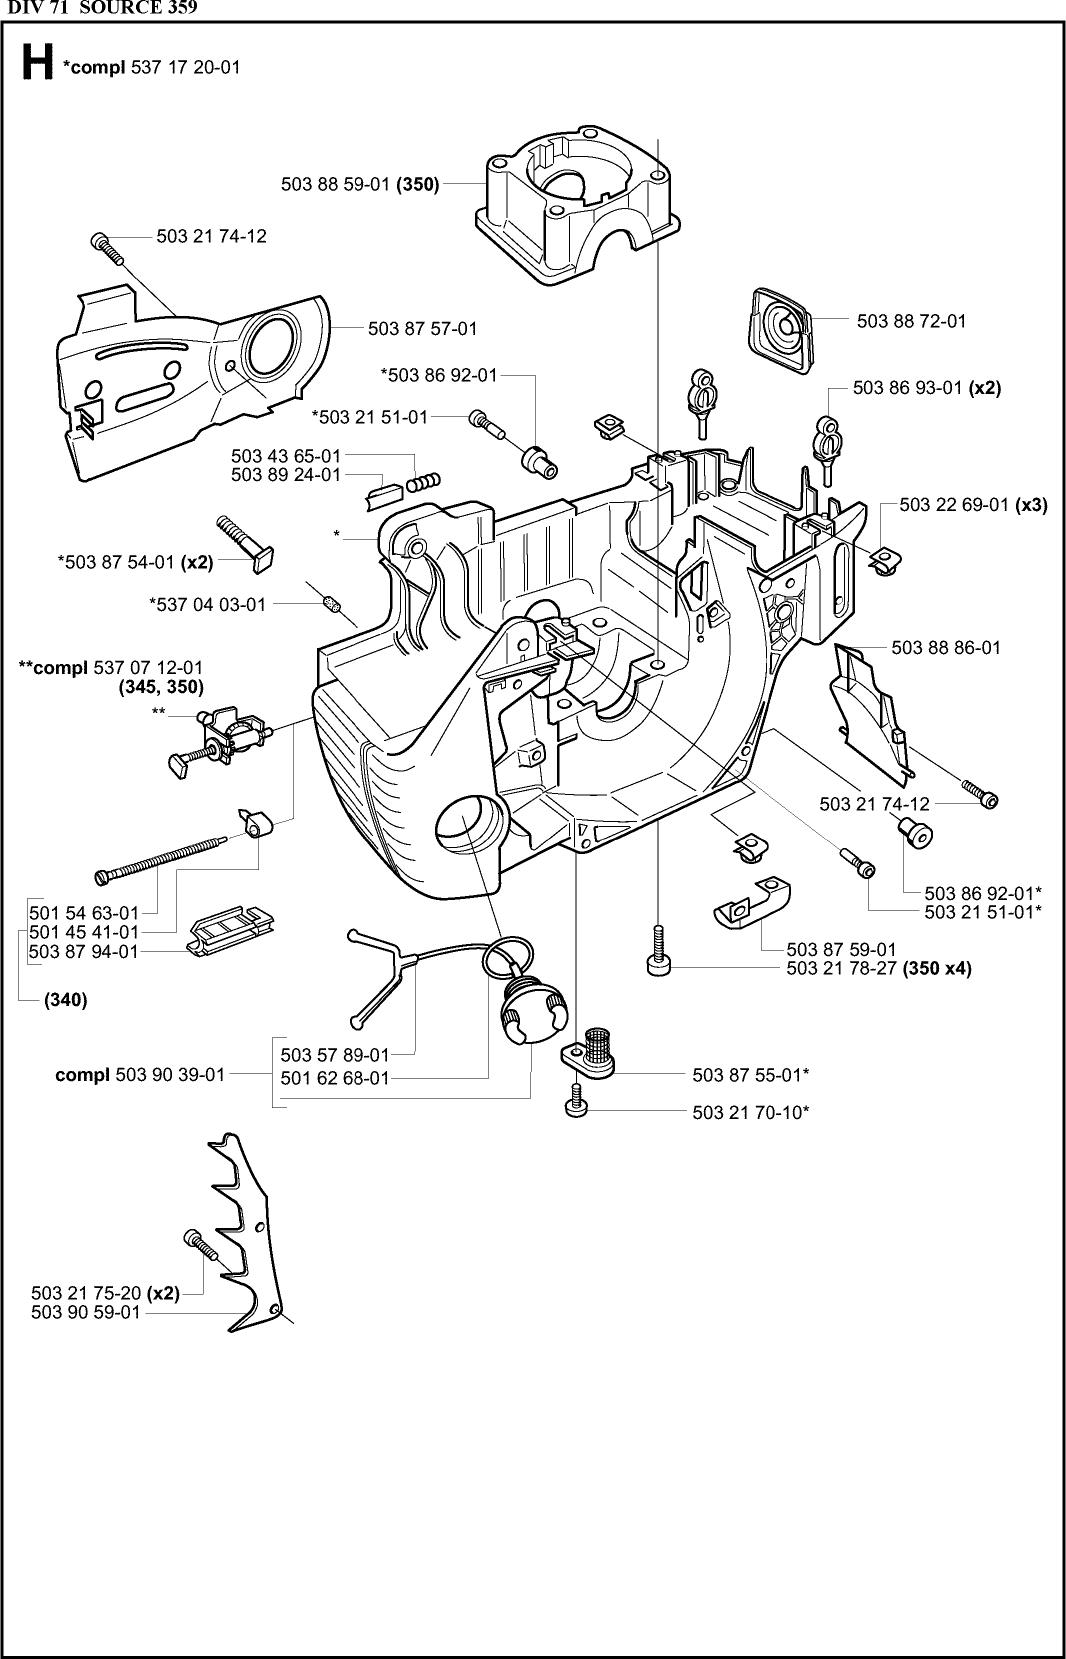 Warn Winch Wiring Diagram on